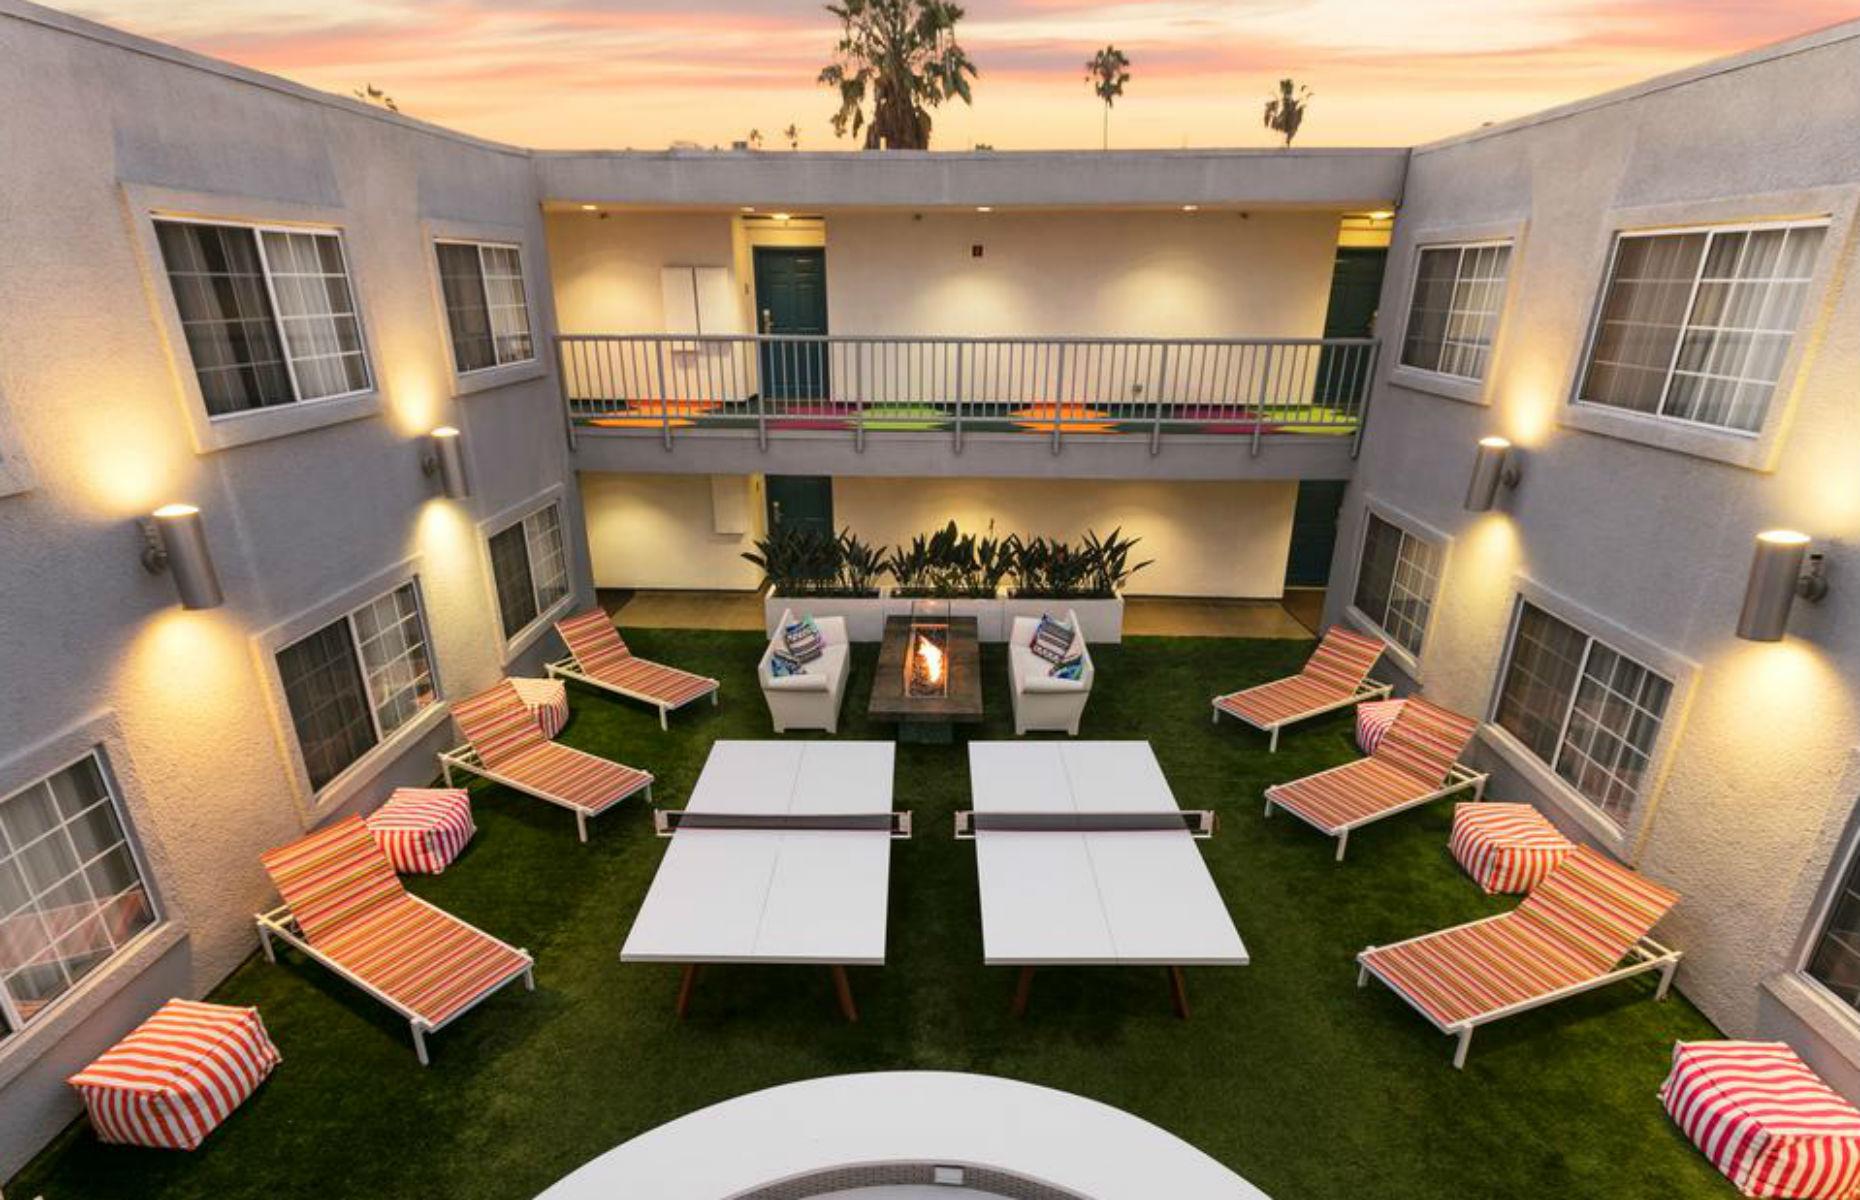 The Kinney courtyard